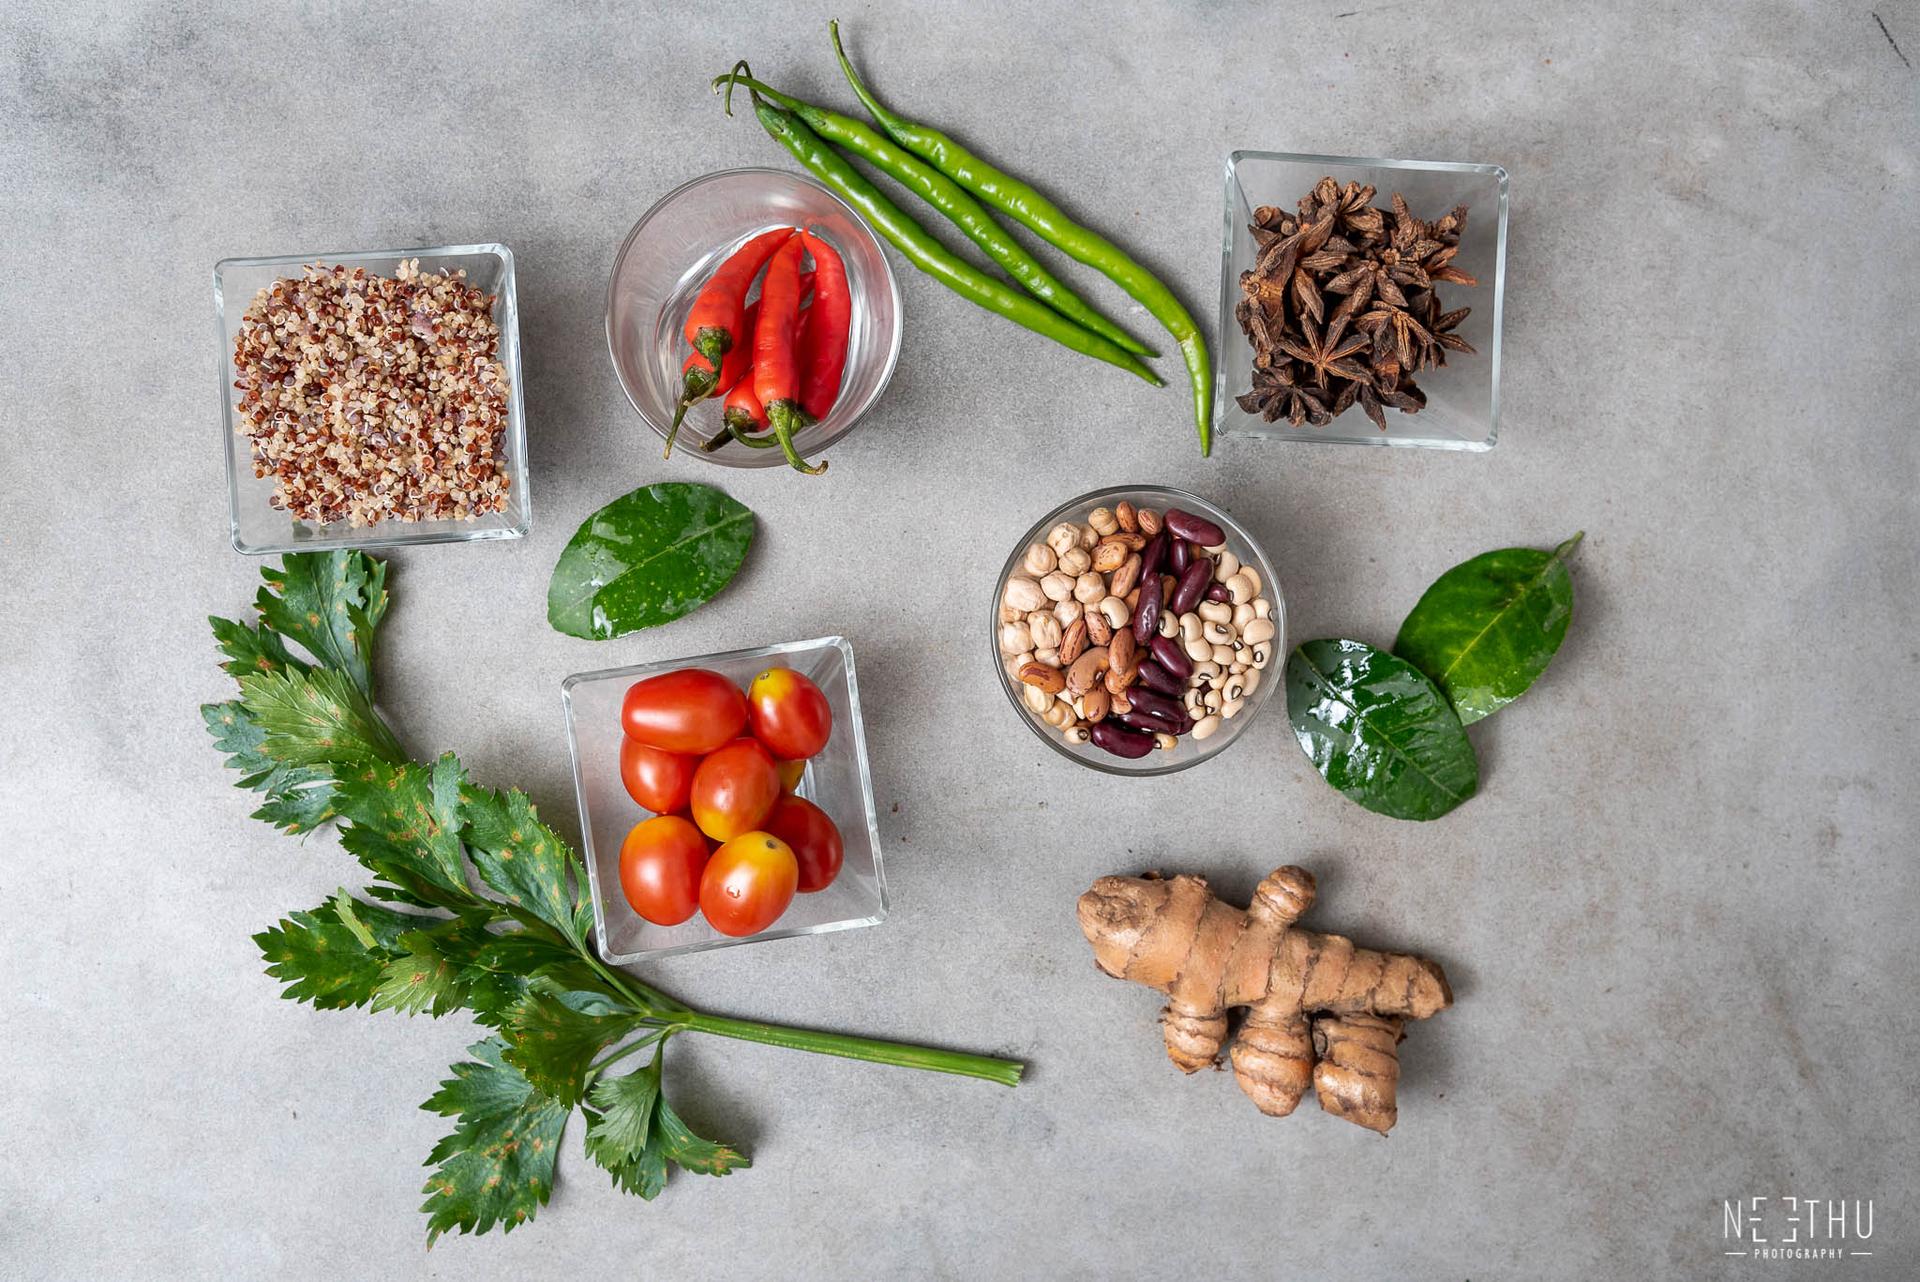 Purnis Food Blog - NP_DSC0701_20181015_153352